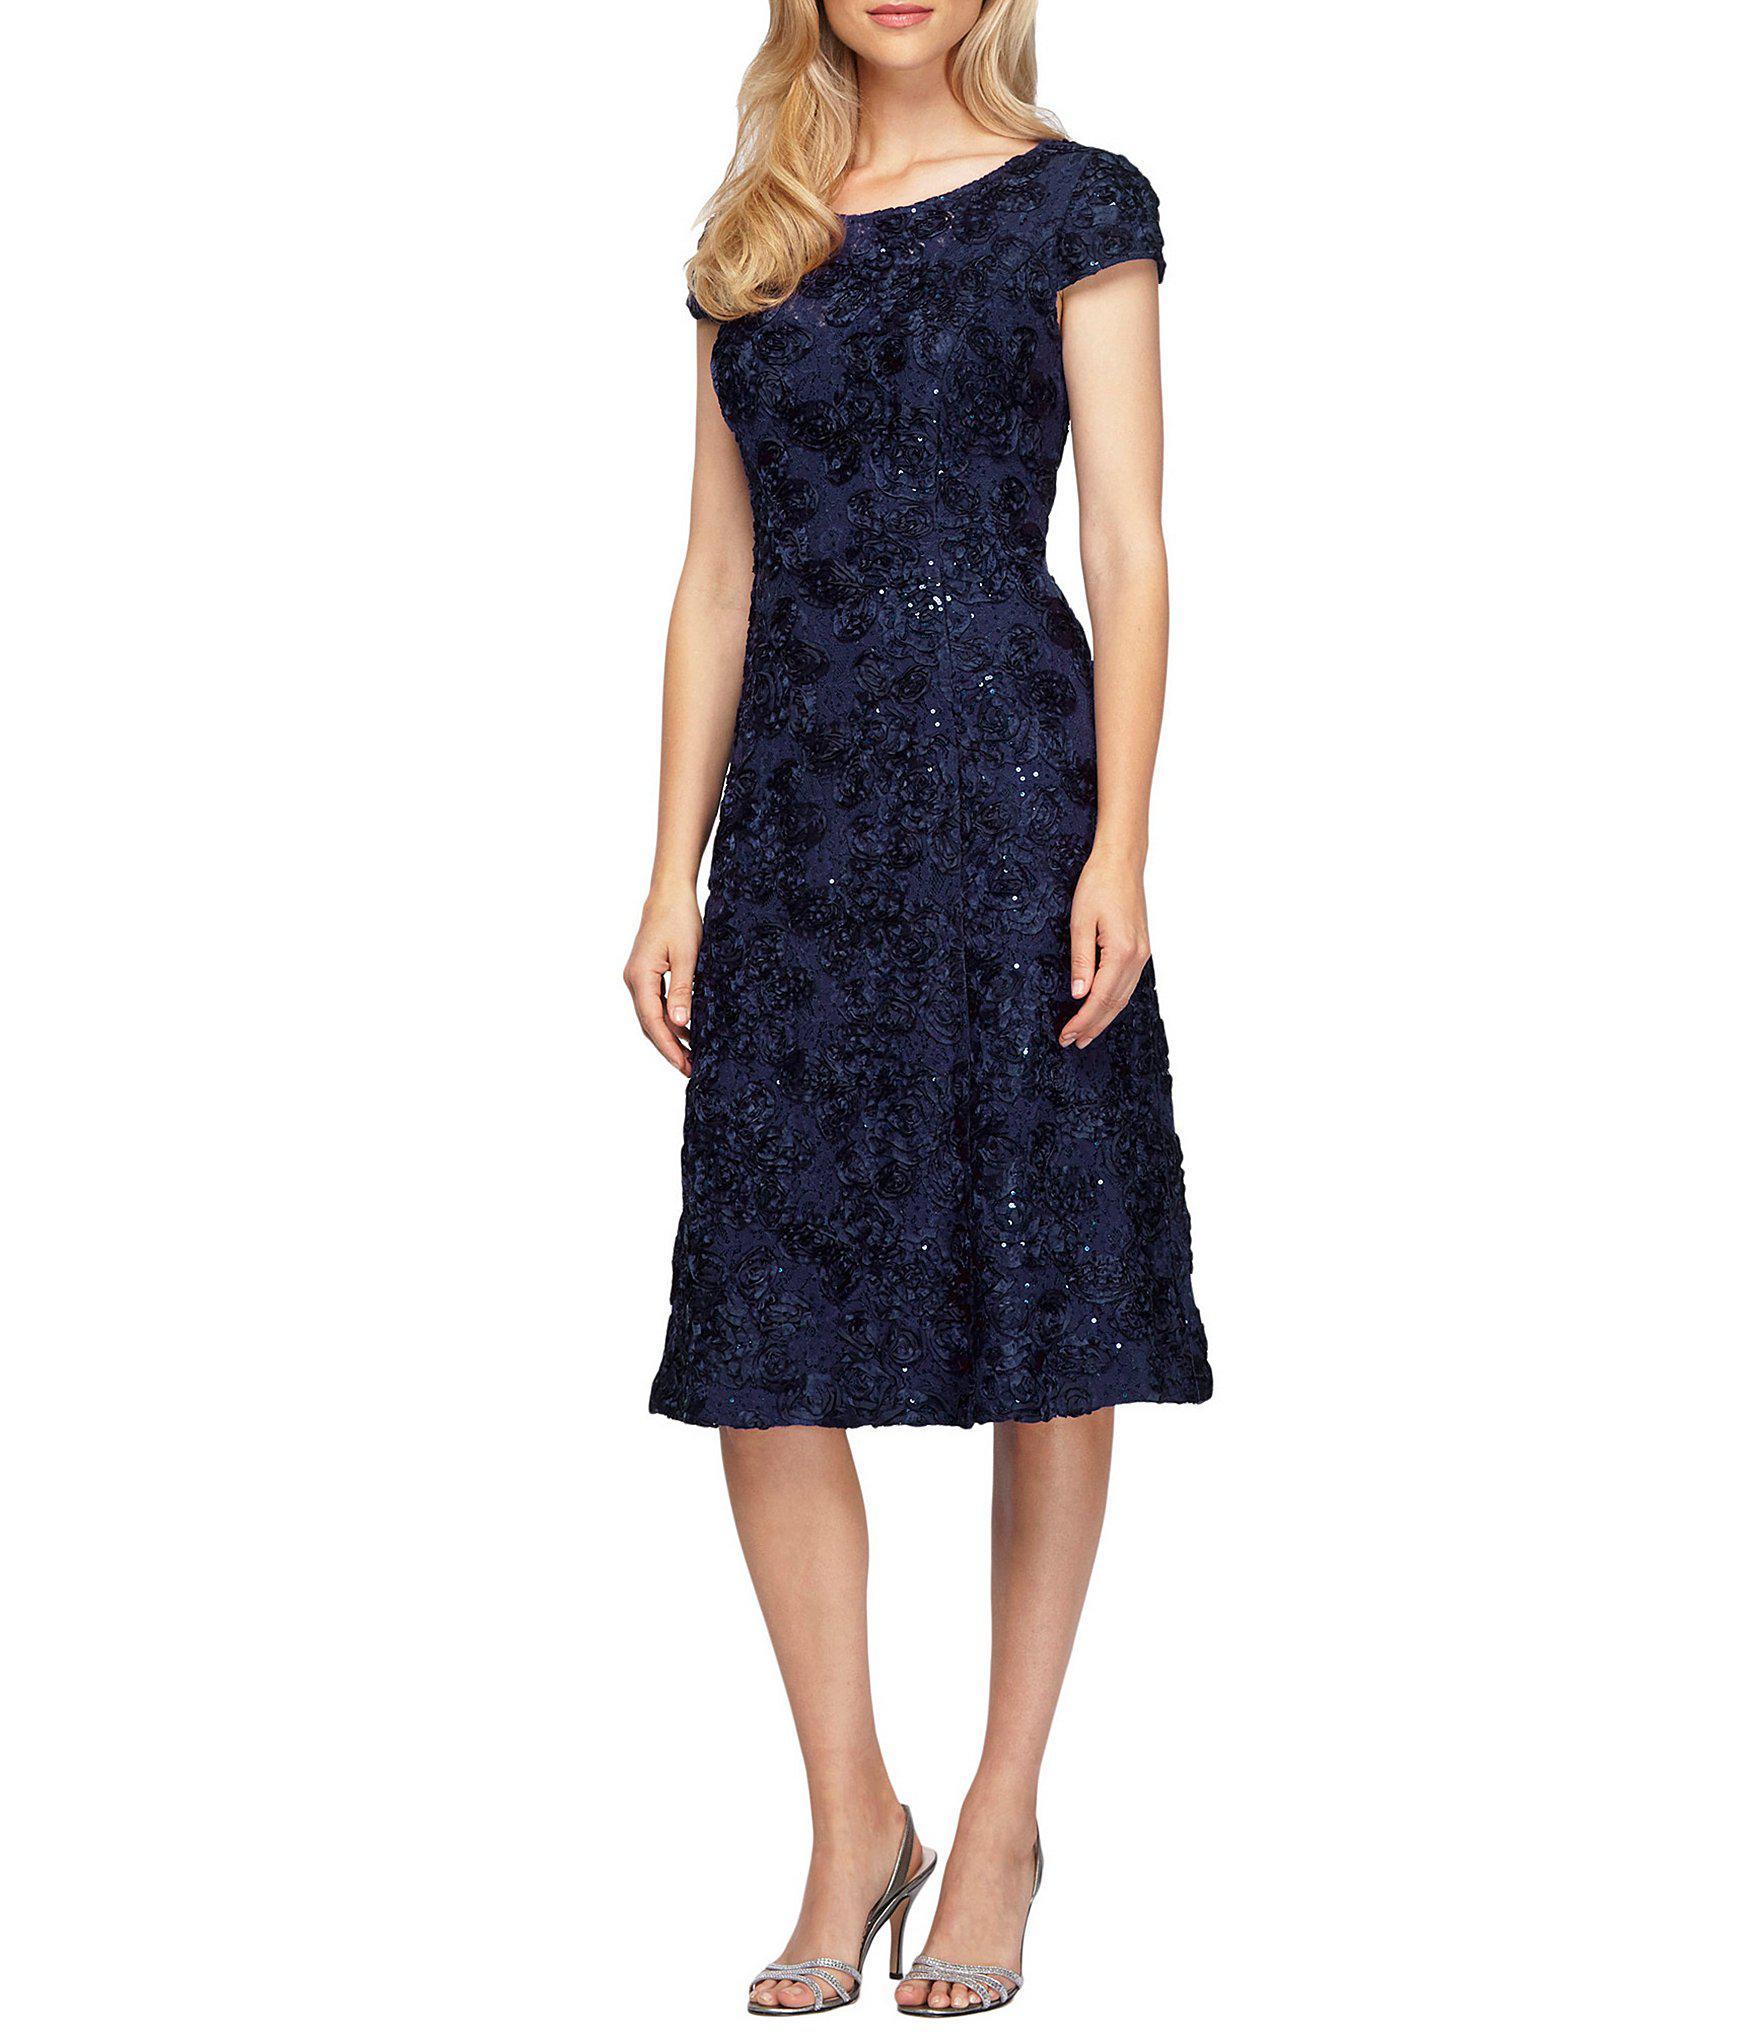 28cd09089405 Petite Evening Dresses Dillards